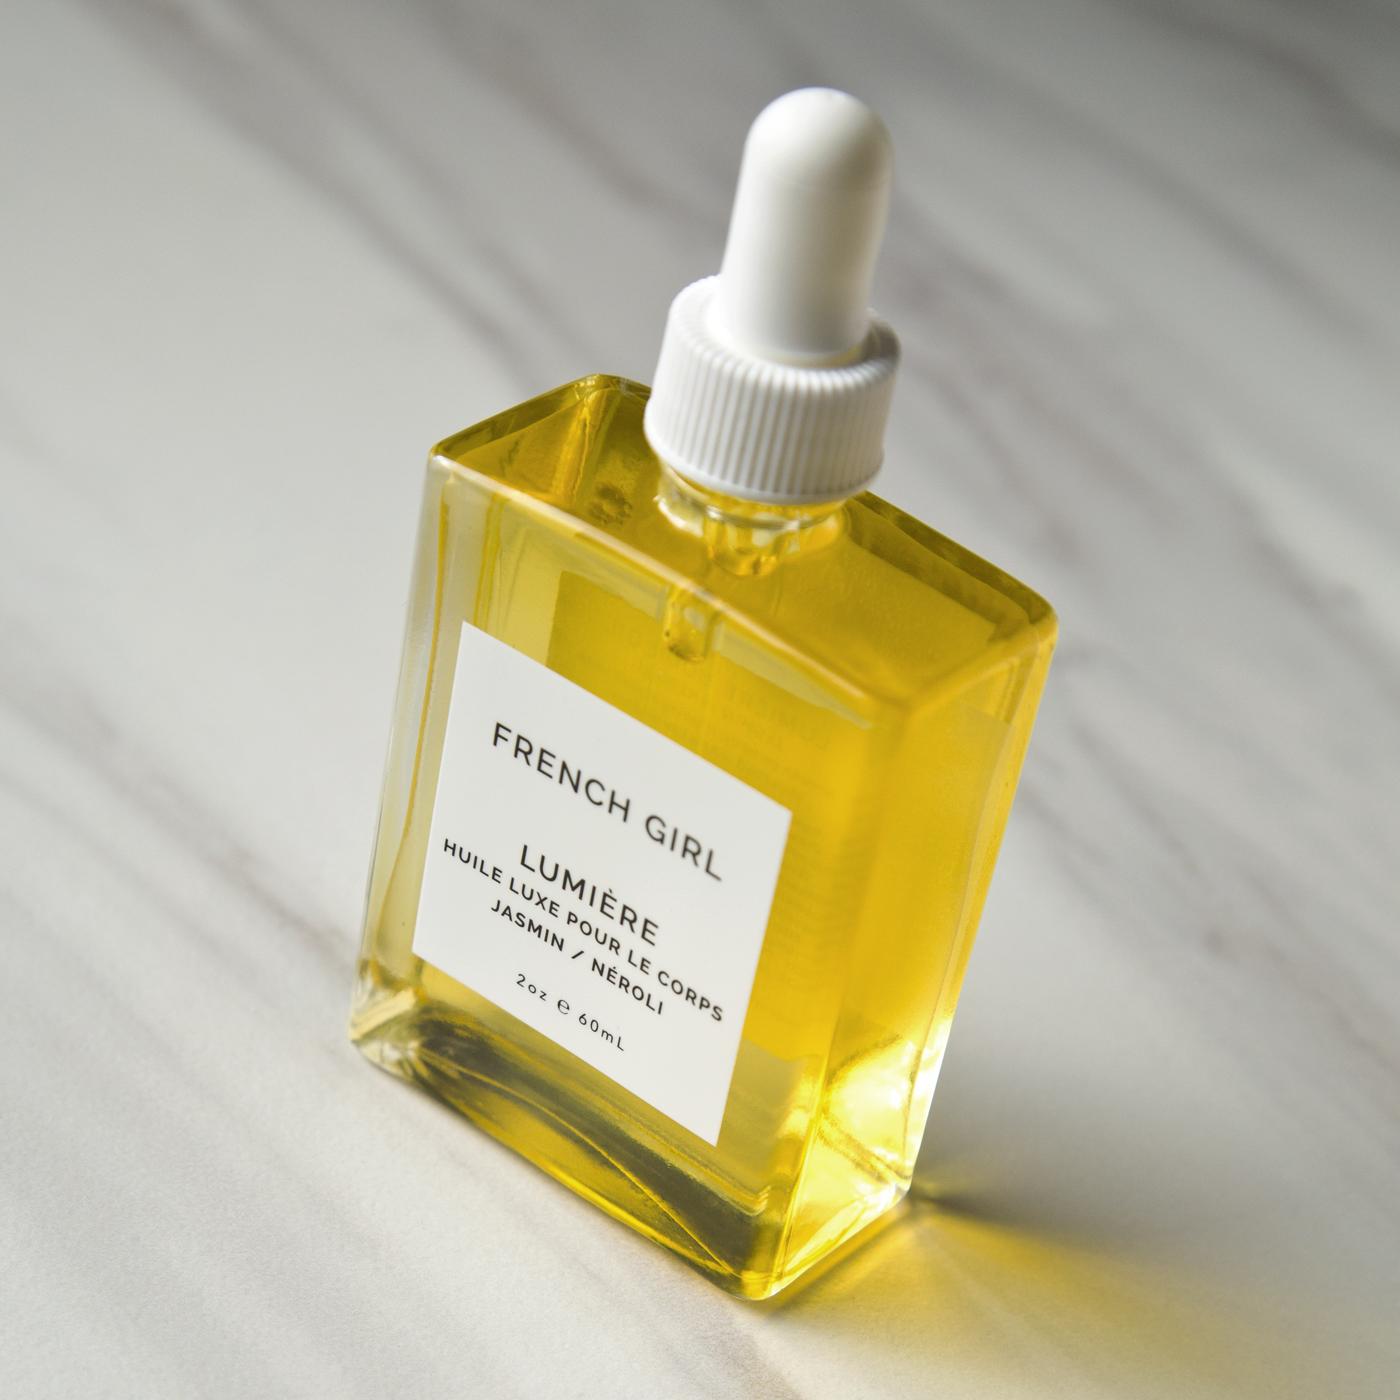 French Girl Organics Lumière Body Oil